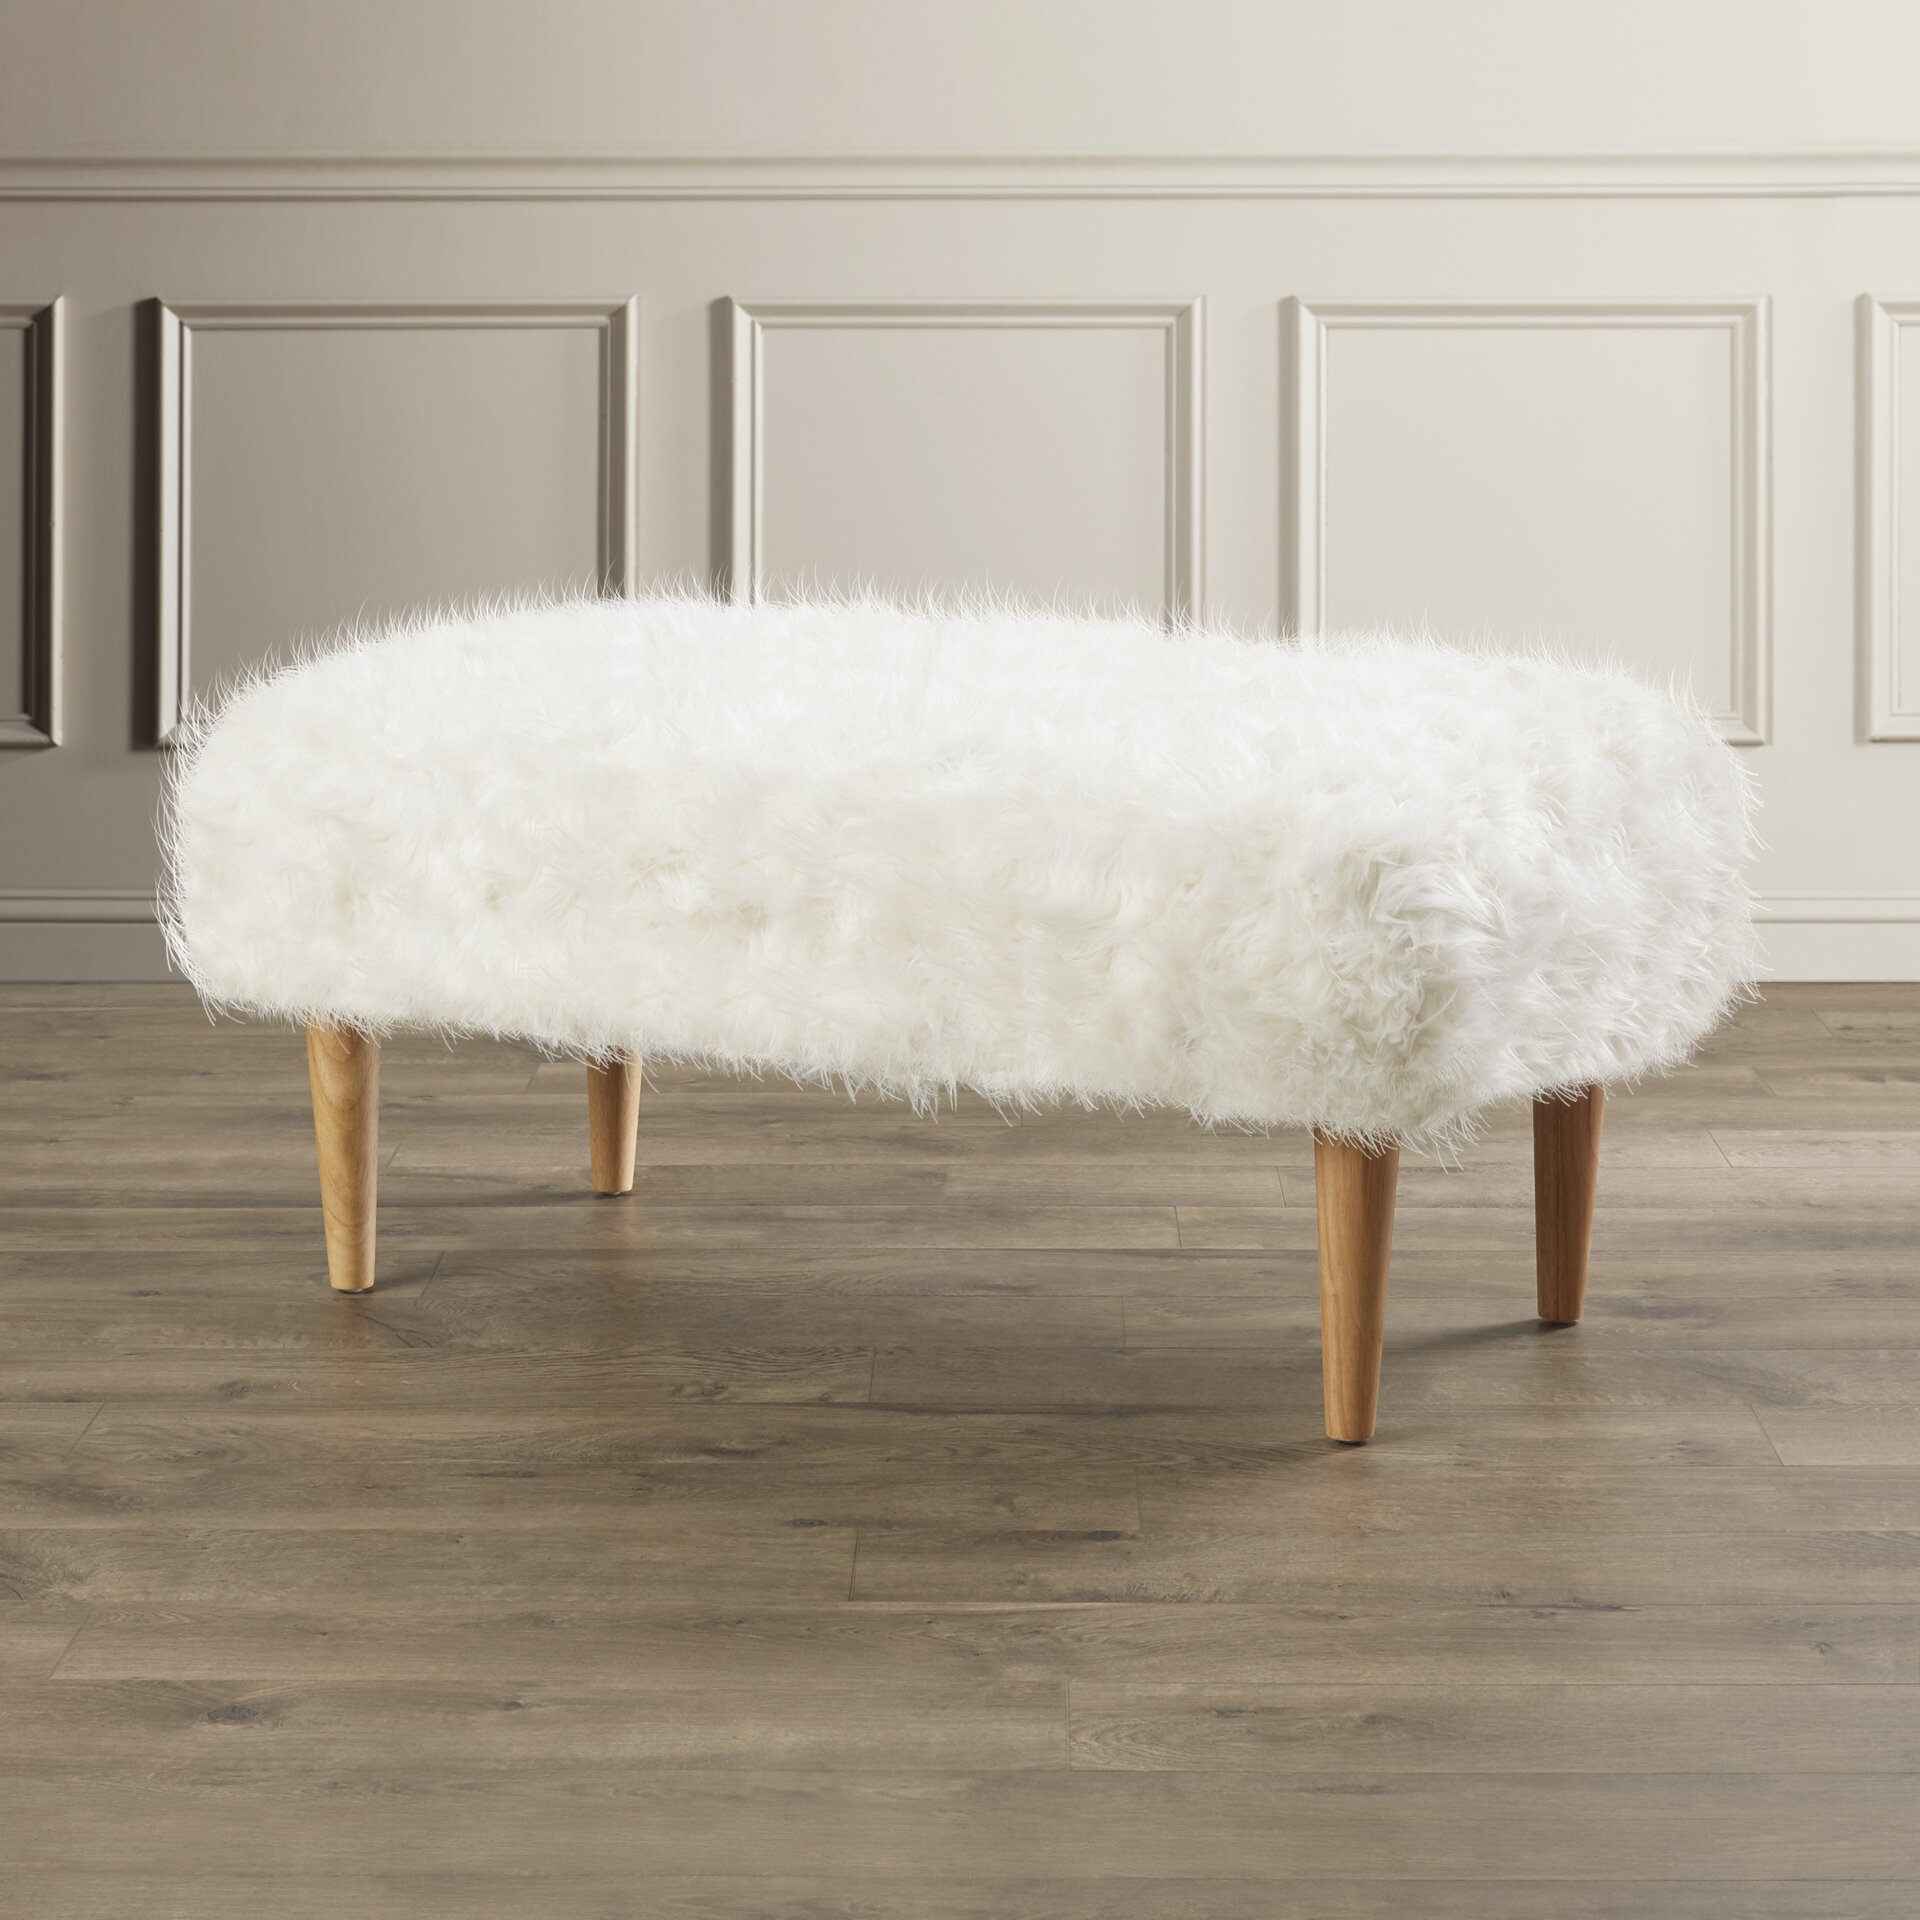 Mercer41 Carbon Upholstered Bedroom Bench Reviews Wayfair